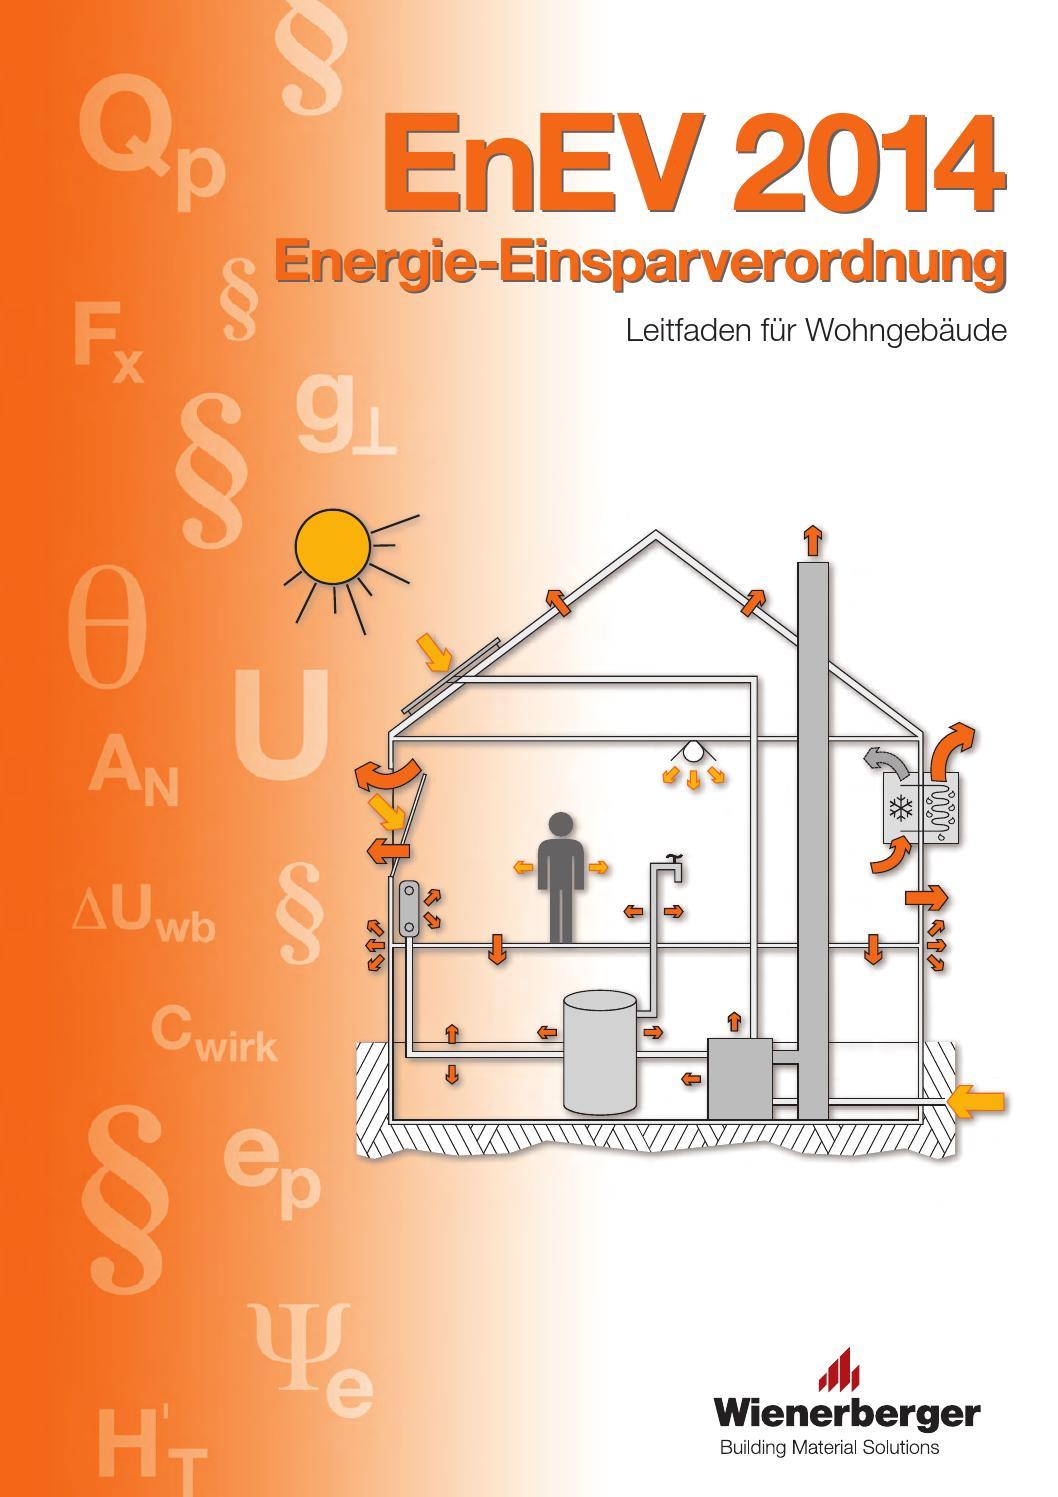 brosch re enev 2014 energie einsparverordnung by wienerberger ag issuu. Black Bedroom Furniture Sets. Home Design Ideas